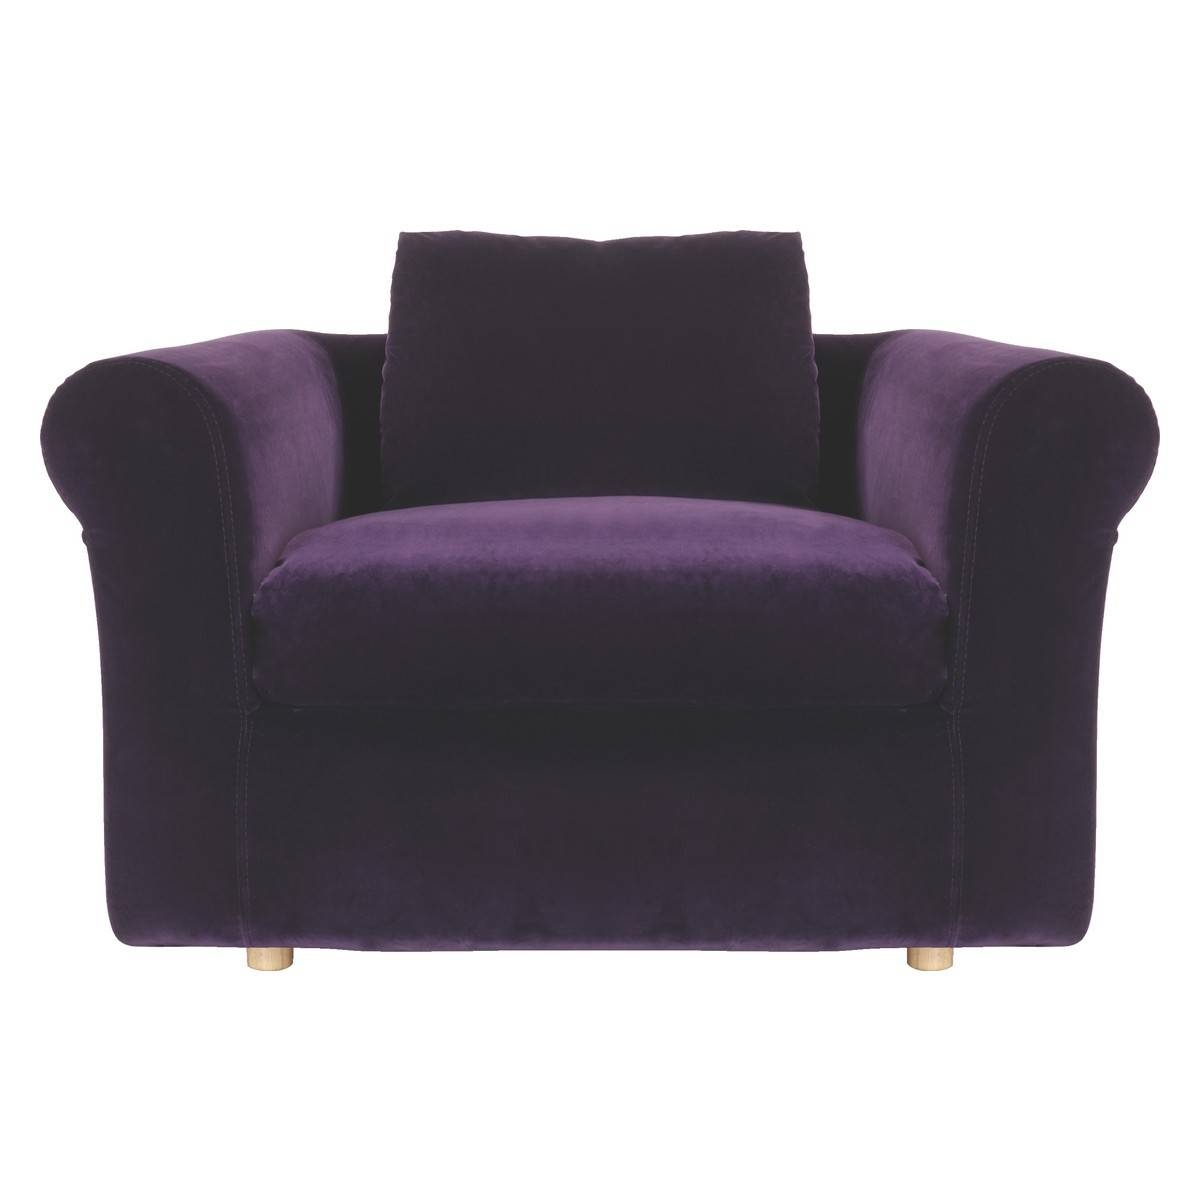 Sofas Center : Literarywondrous Single Sofa Chair Picture Ideas with regard to Single Sofa Chairs (Image 25 of 30)